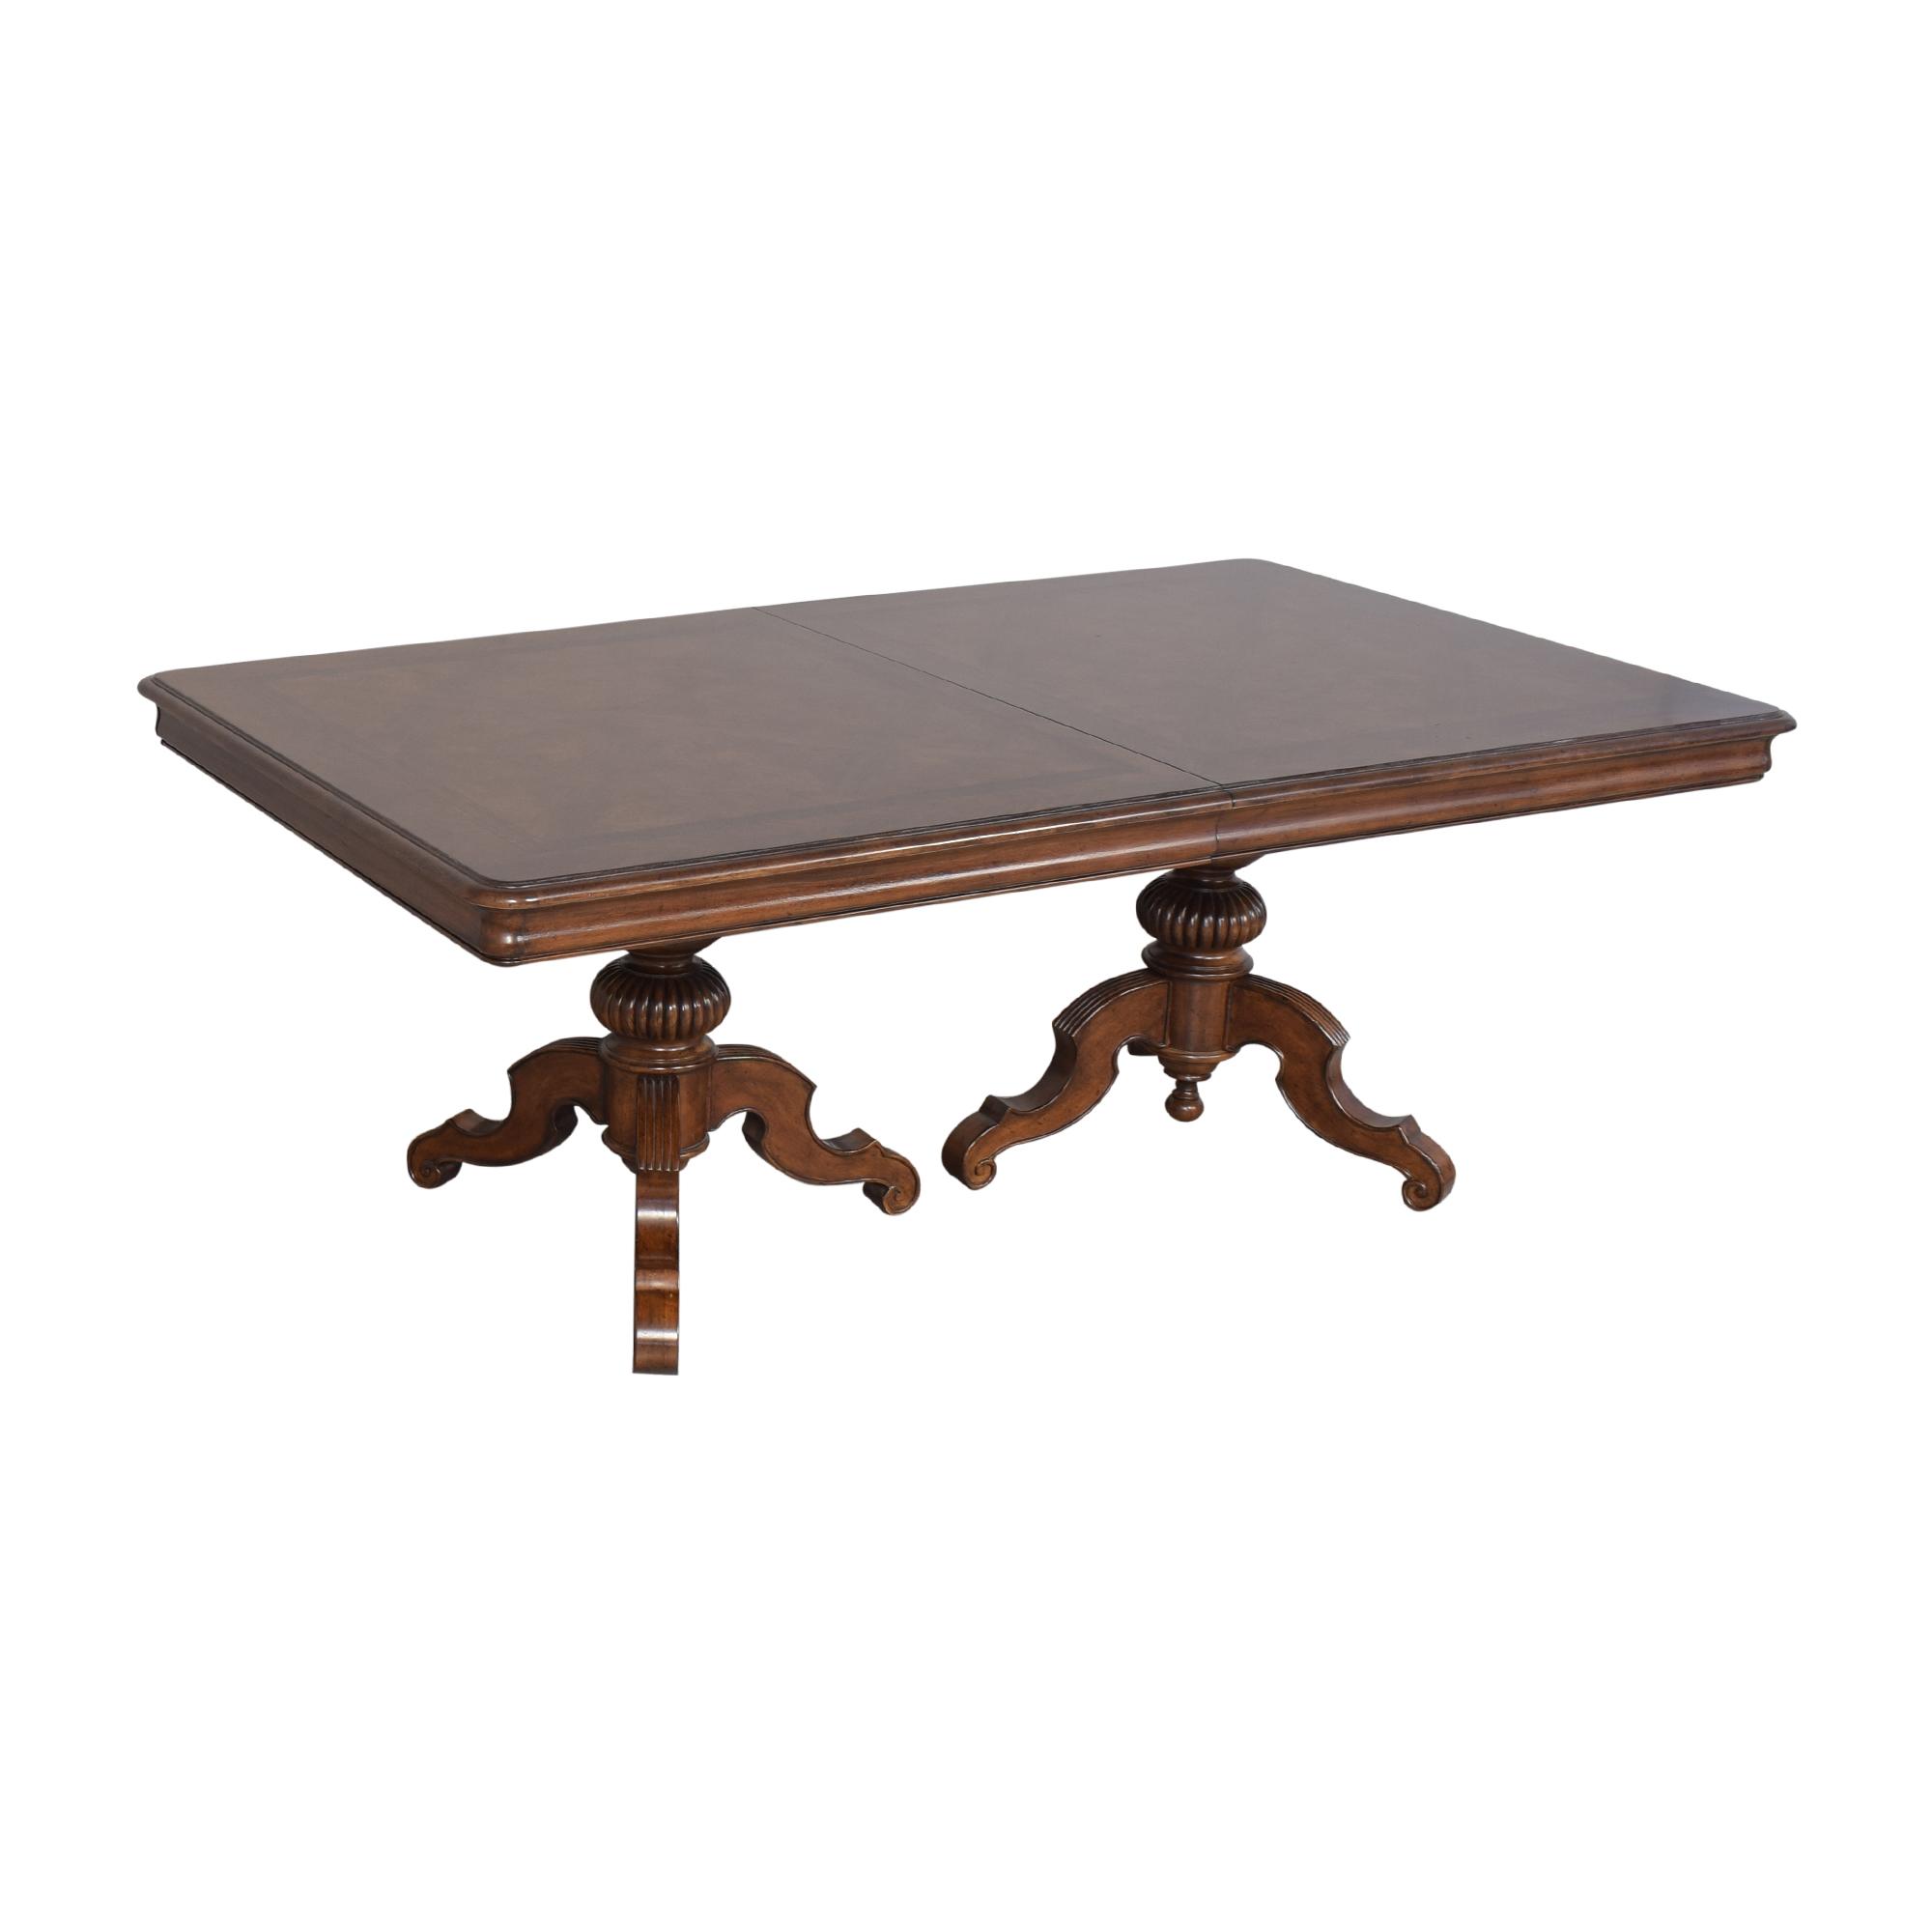 Thomasville Thomasville Ernest Hemingway Castillian Double Pedestal Dining Table ct